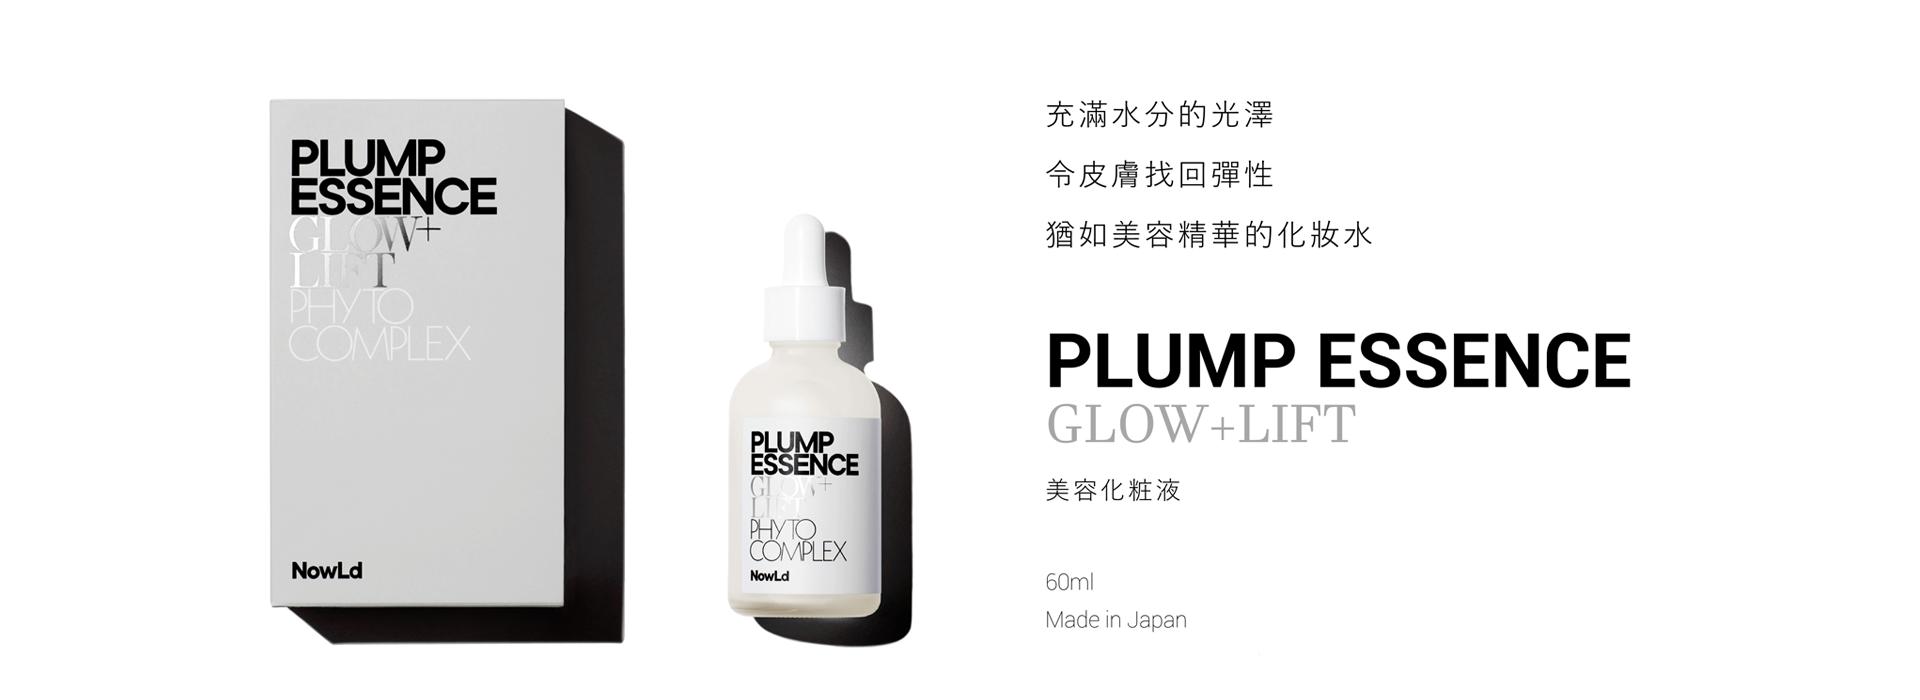 Plump Essence